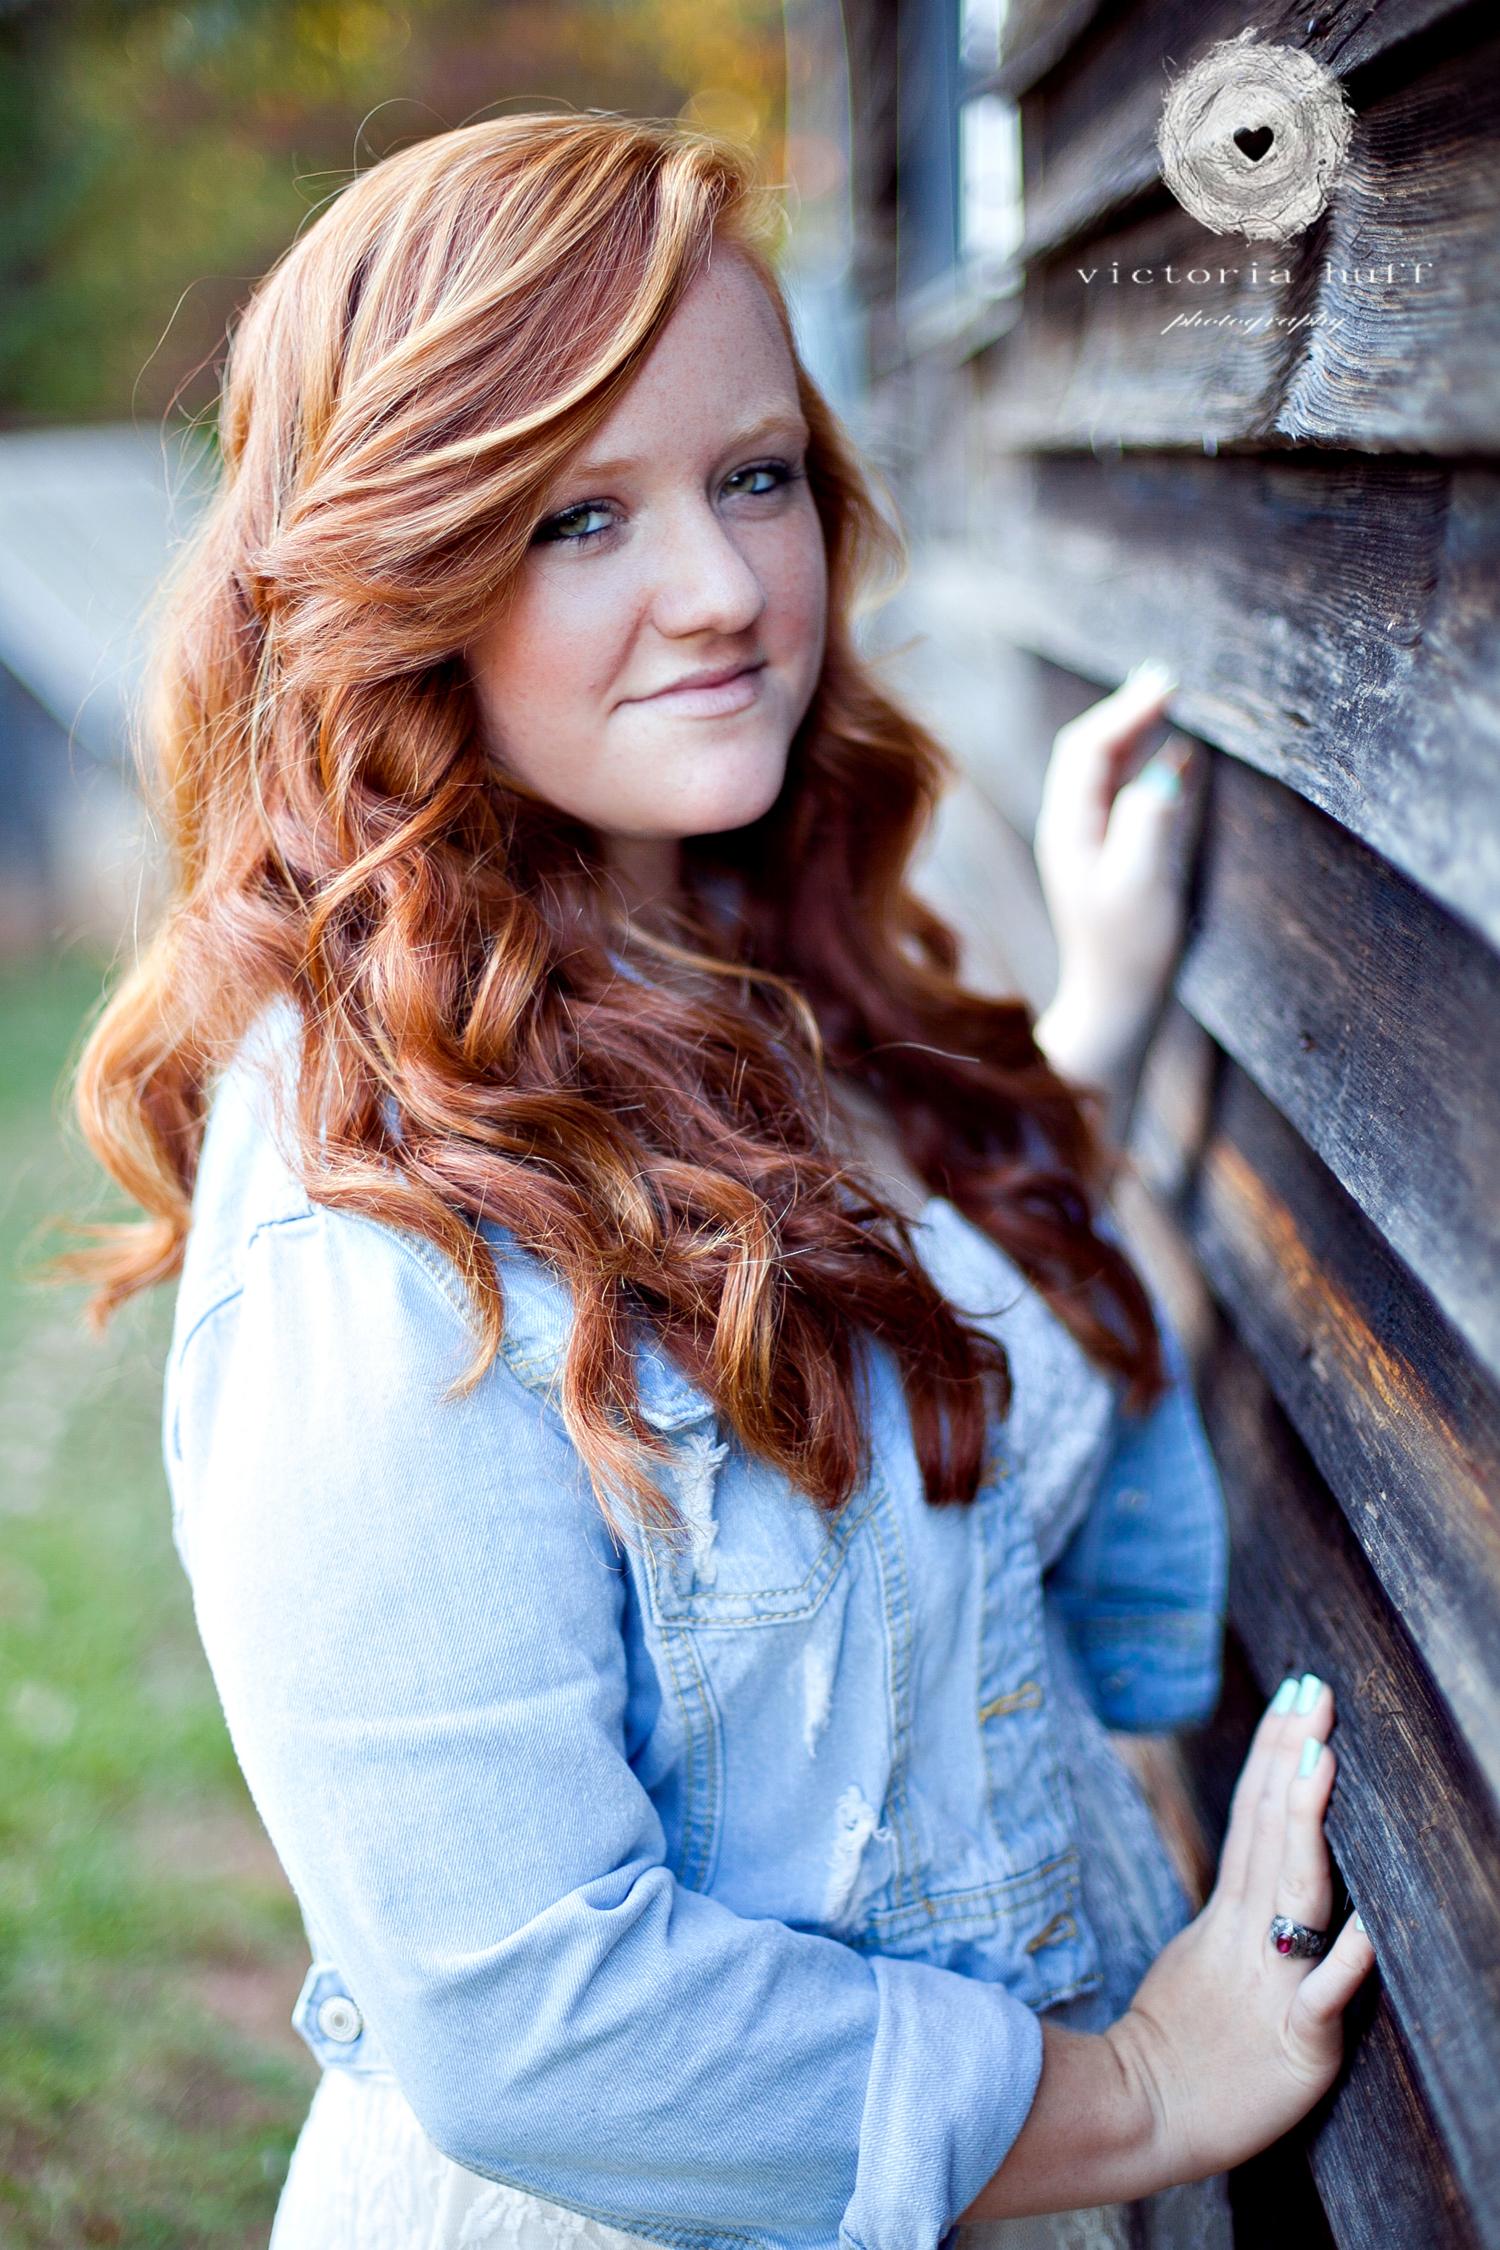 Courtney-Harkins-Senior-Portraits-Jefferson-Athens-Georgia-Red-Hair-Photography-4.jpg